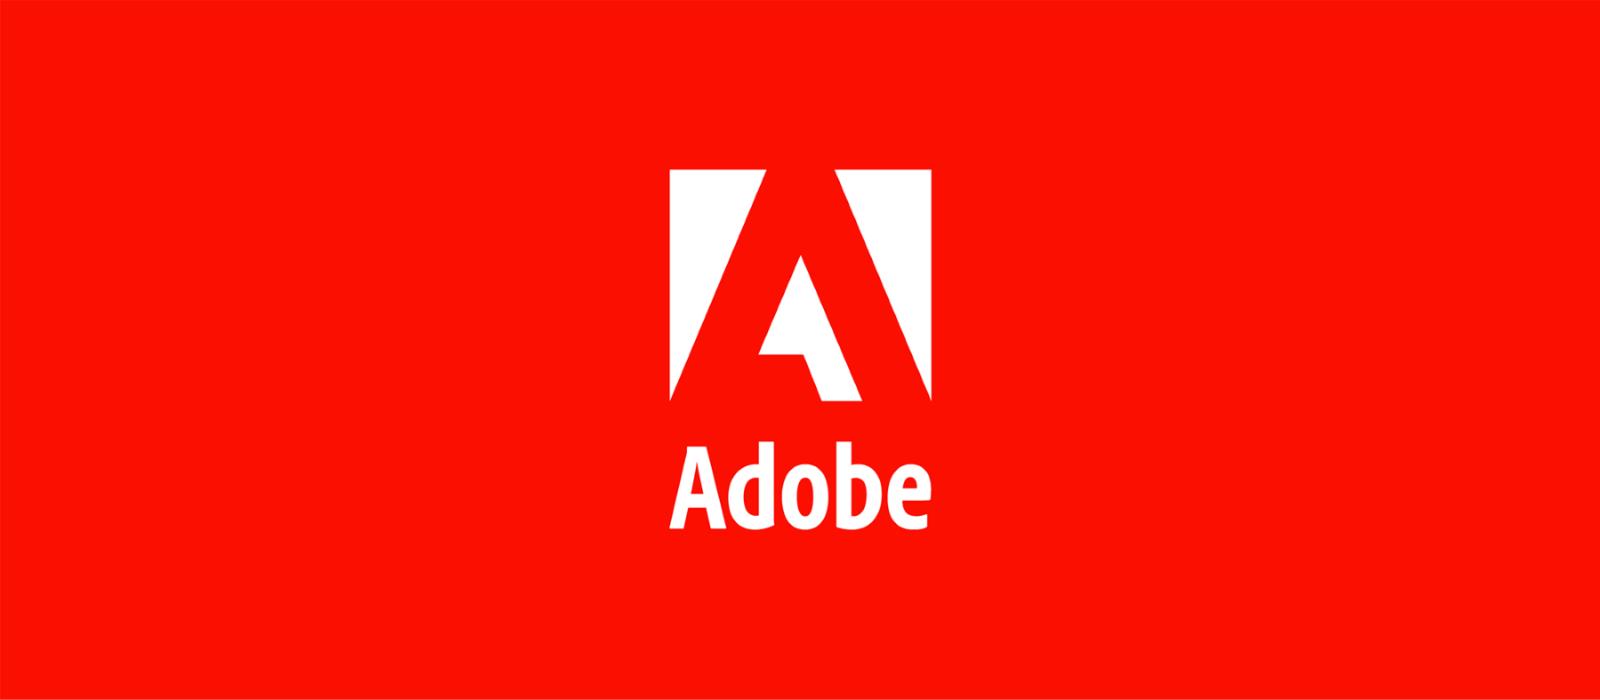 Adobe fixes critical vulnerabilities in InDesign and Framemaker